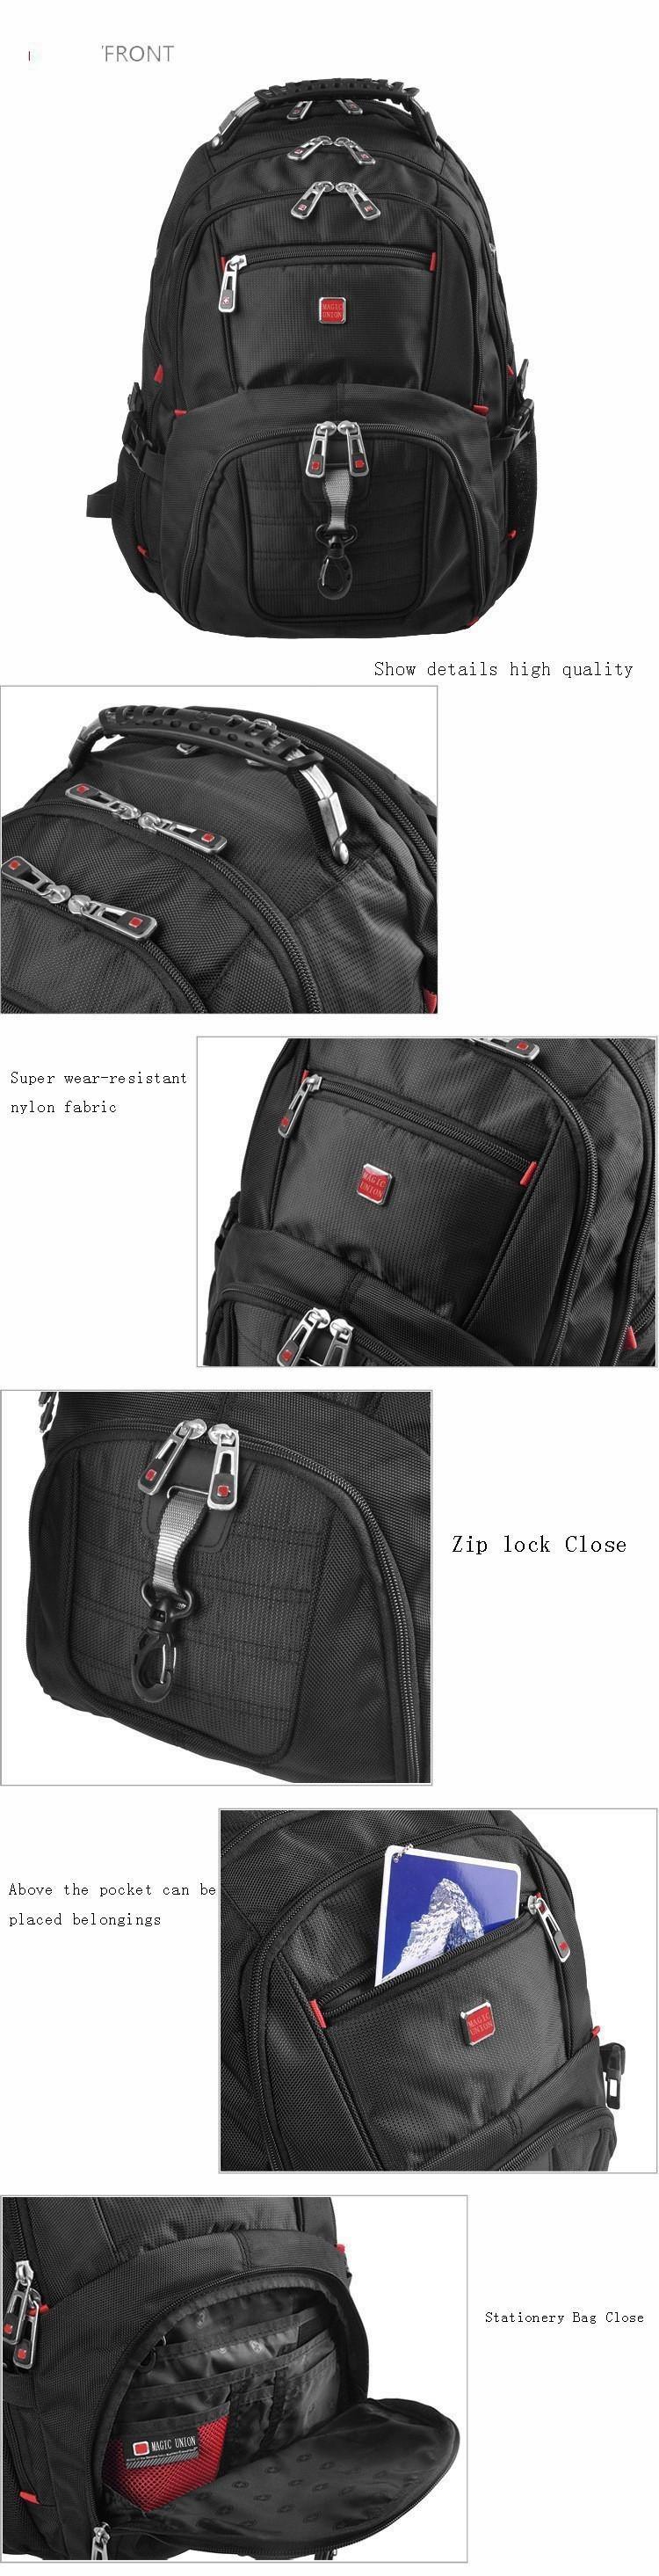 MAGIC UNION Oxford Men Laptop Backpack Mochila Masculina 15 Inch Man's Backpacks Men's Luggage & Travel bags Wholesale 7